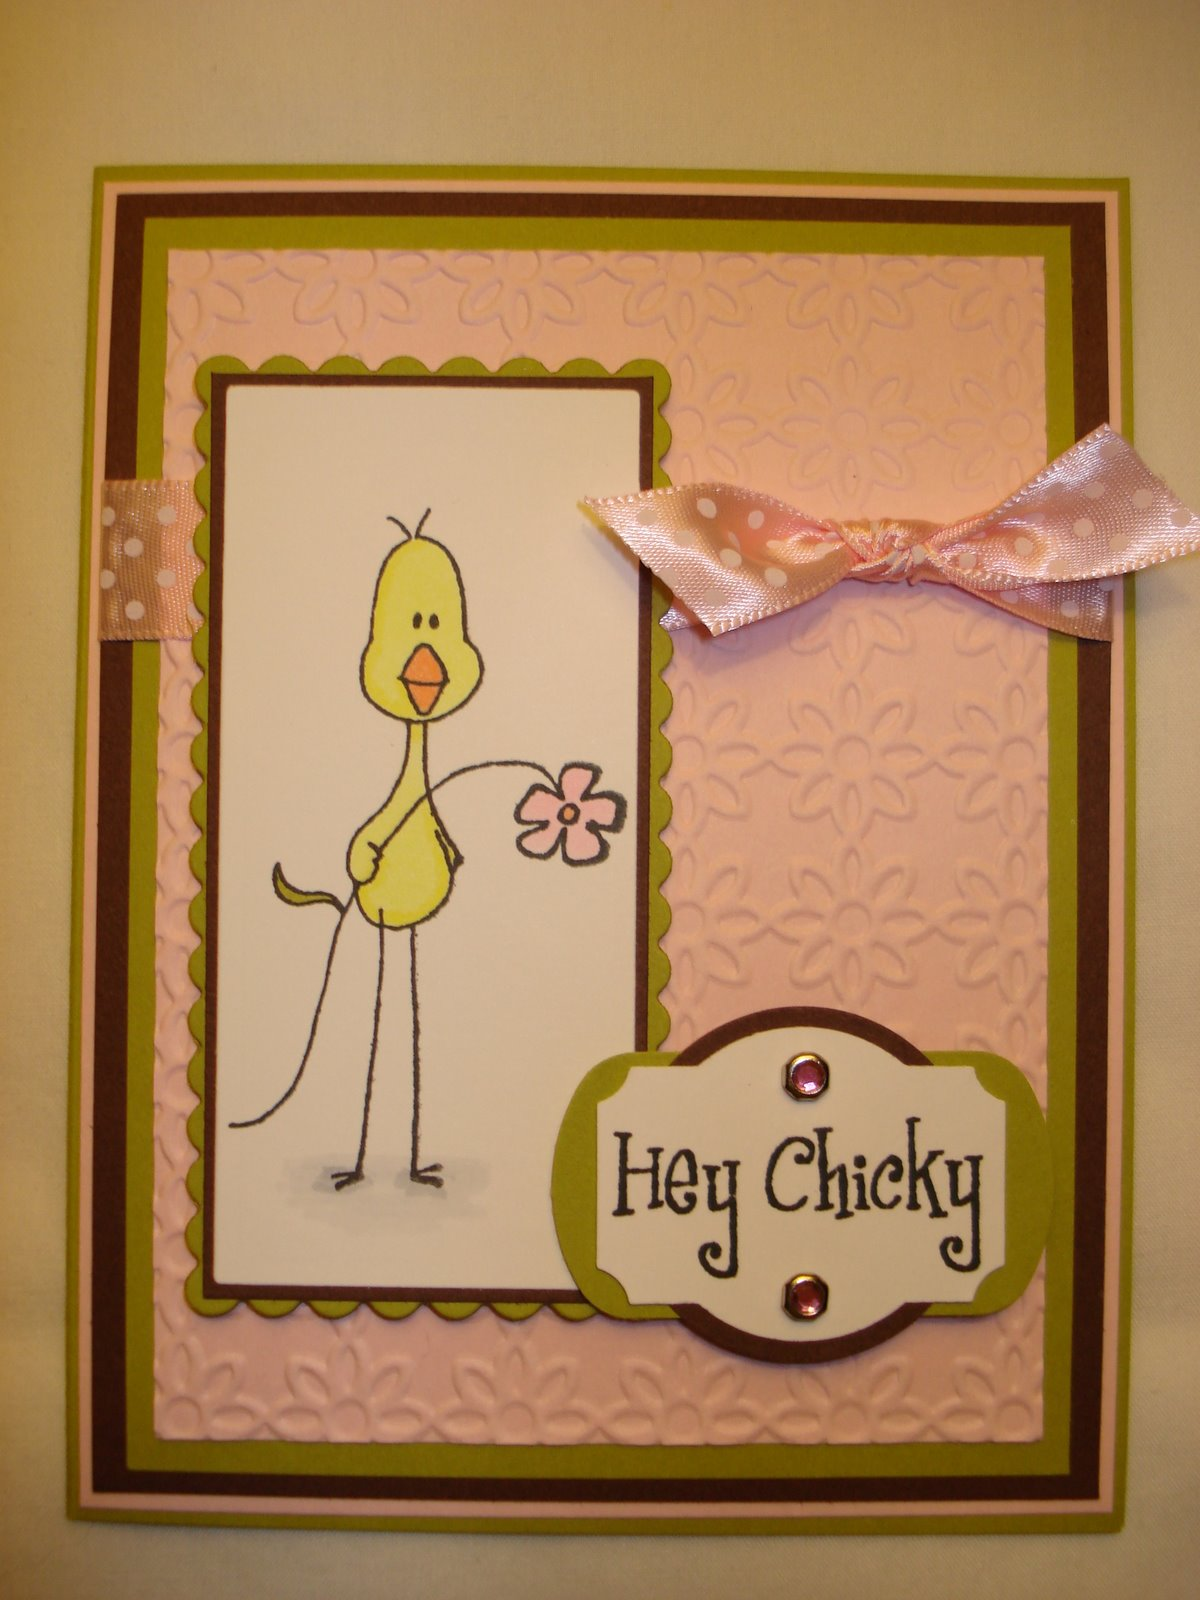 [Hey+Chicky]